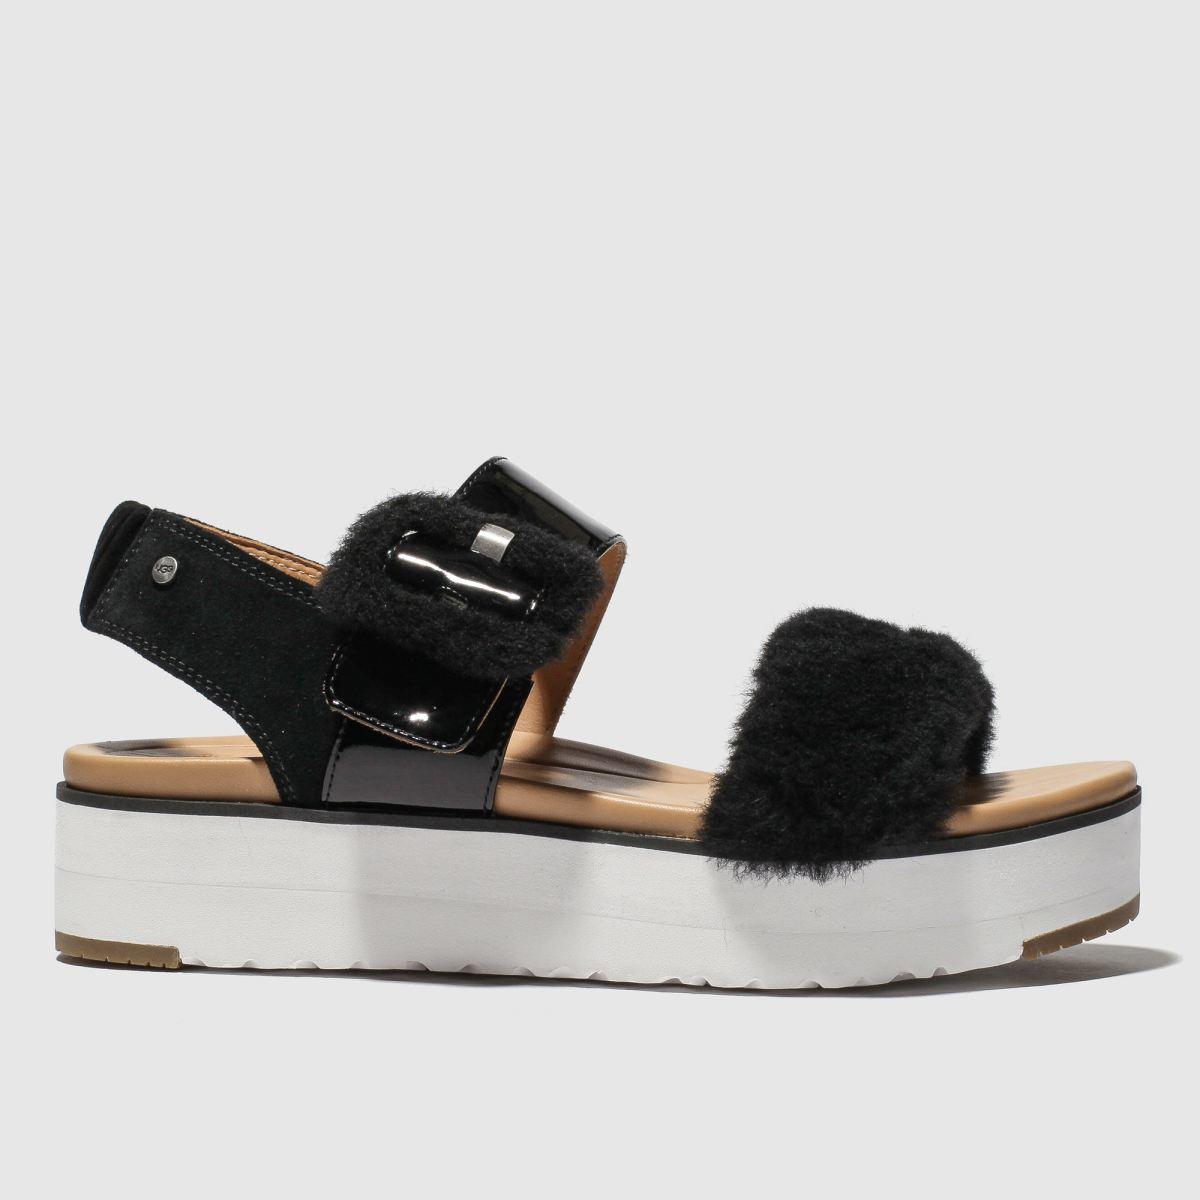 Ugg Black Fluff Chella Sandals